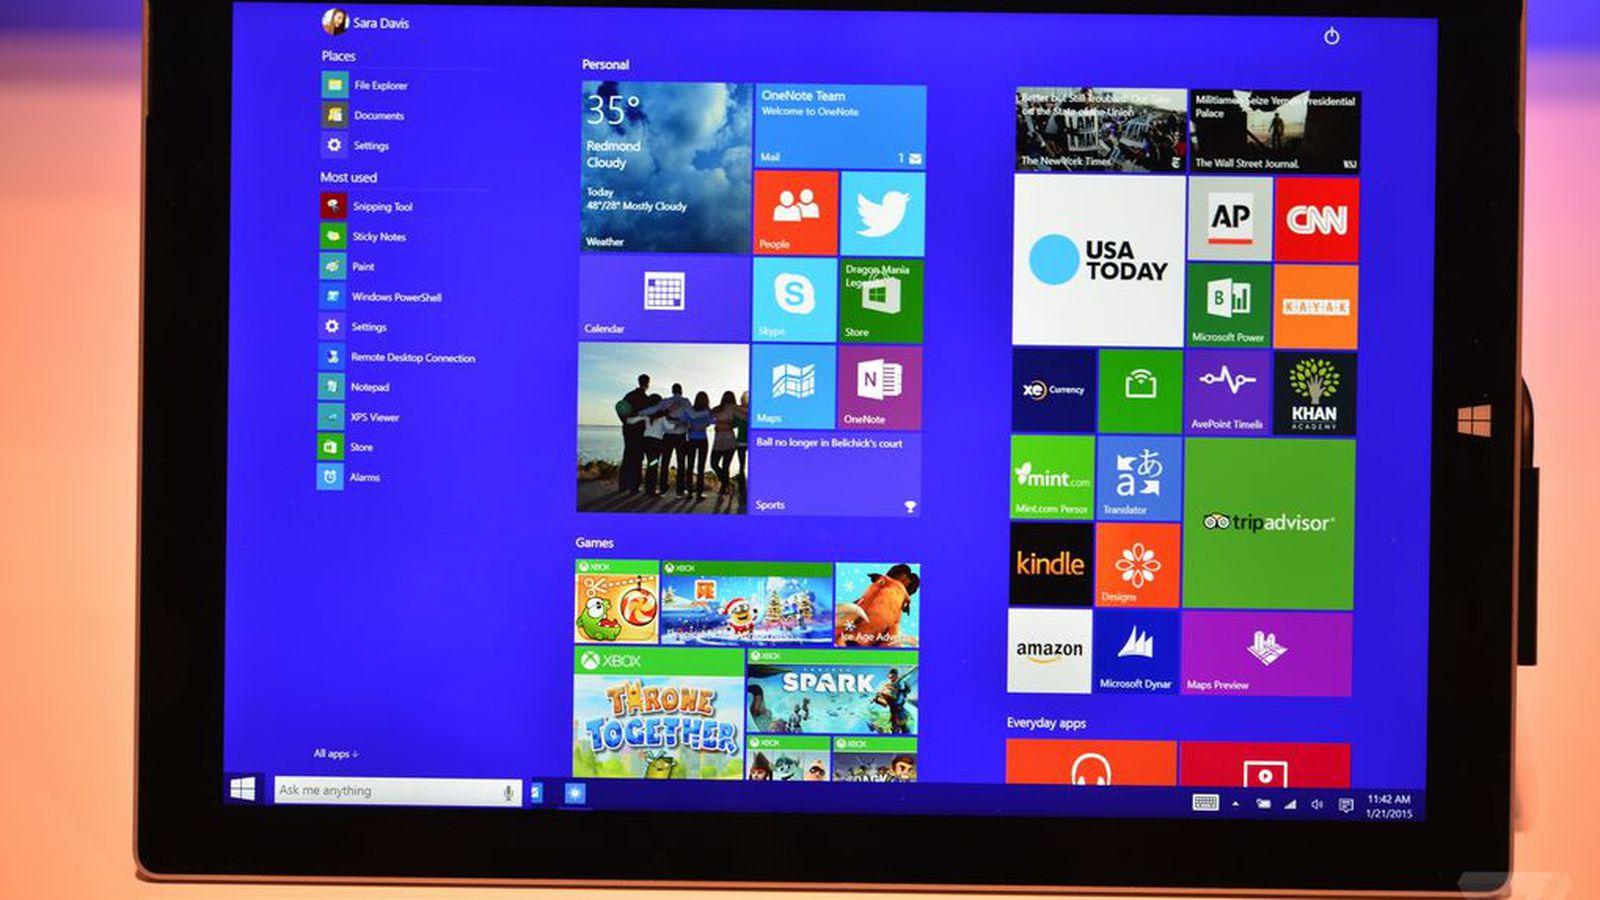 Tumblr Login Screen Not Working: Windows 10's New Music App Looks Like Microsoft's Version